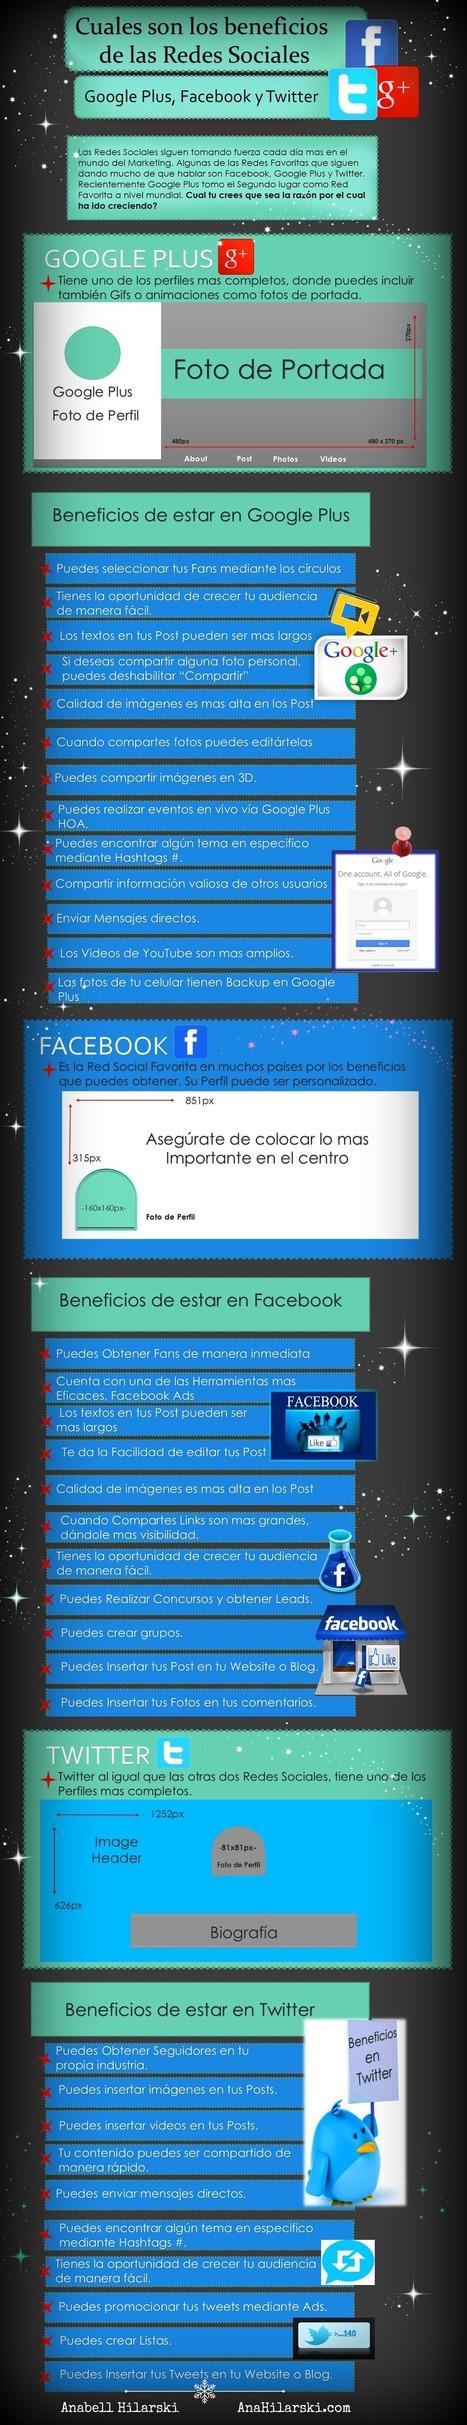 Beneficios de estar en Twitter - FaceBook y Google + #infografia #infographic #socialmedia   Seo, Social Media Marketing   Scoop.it